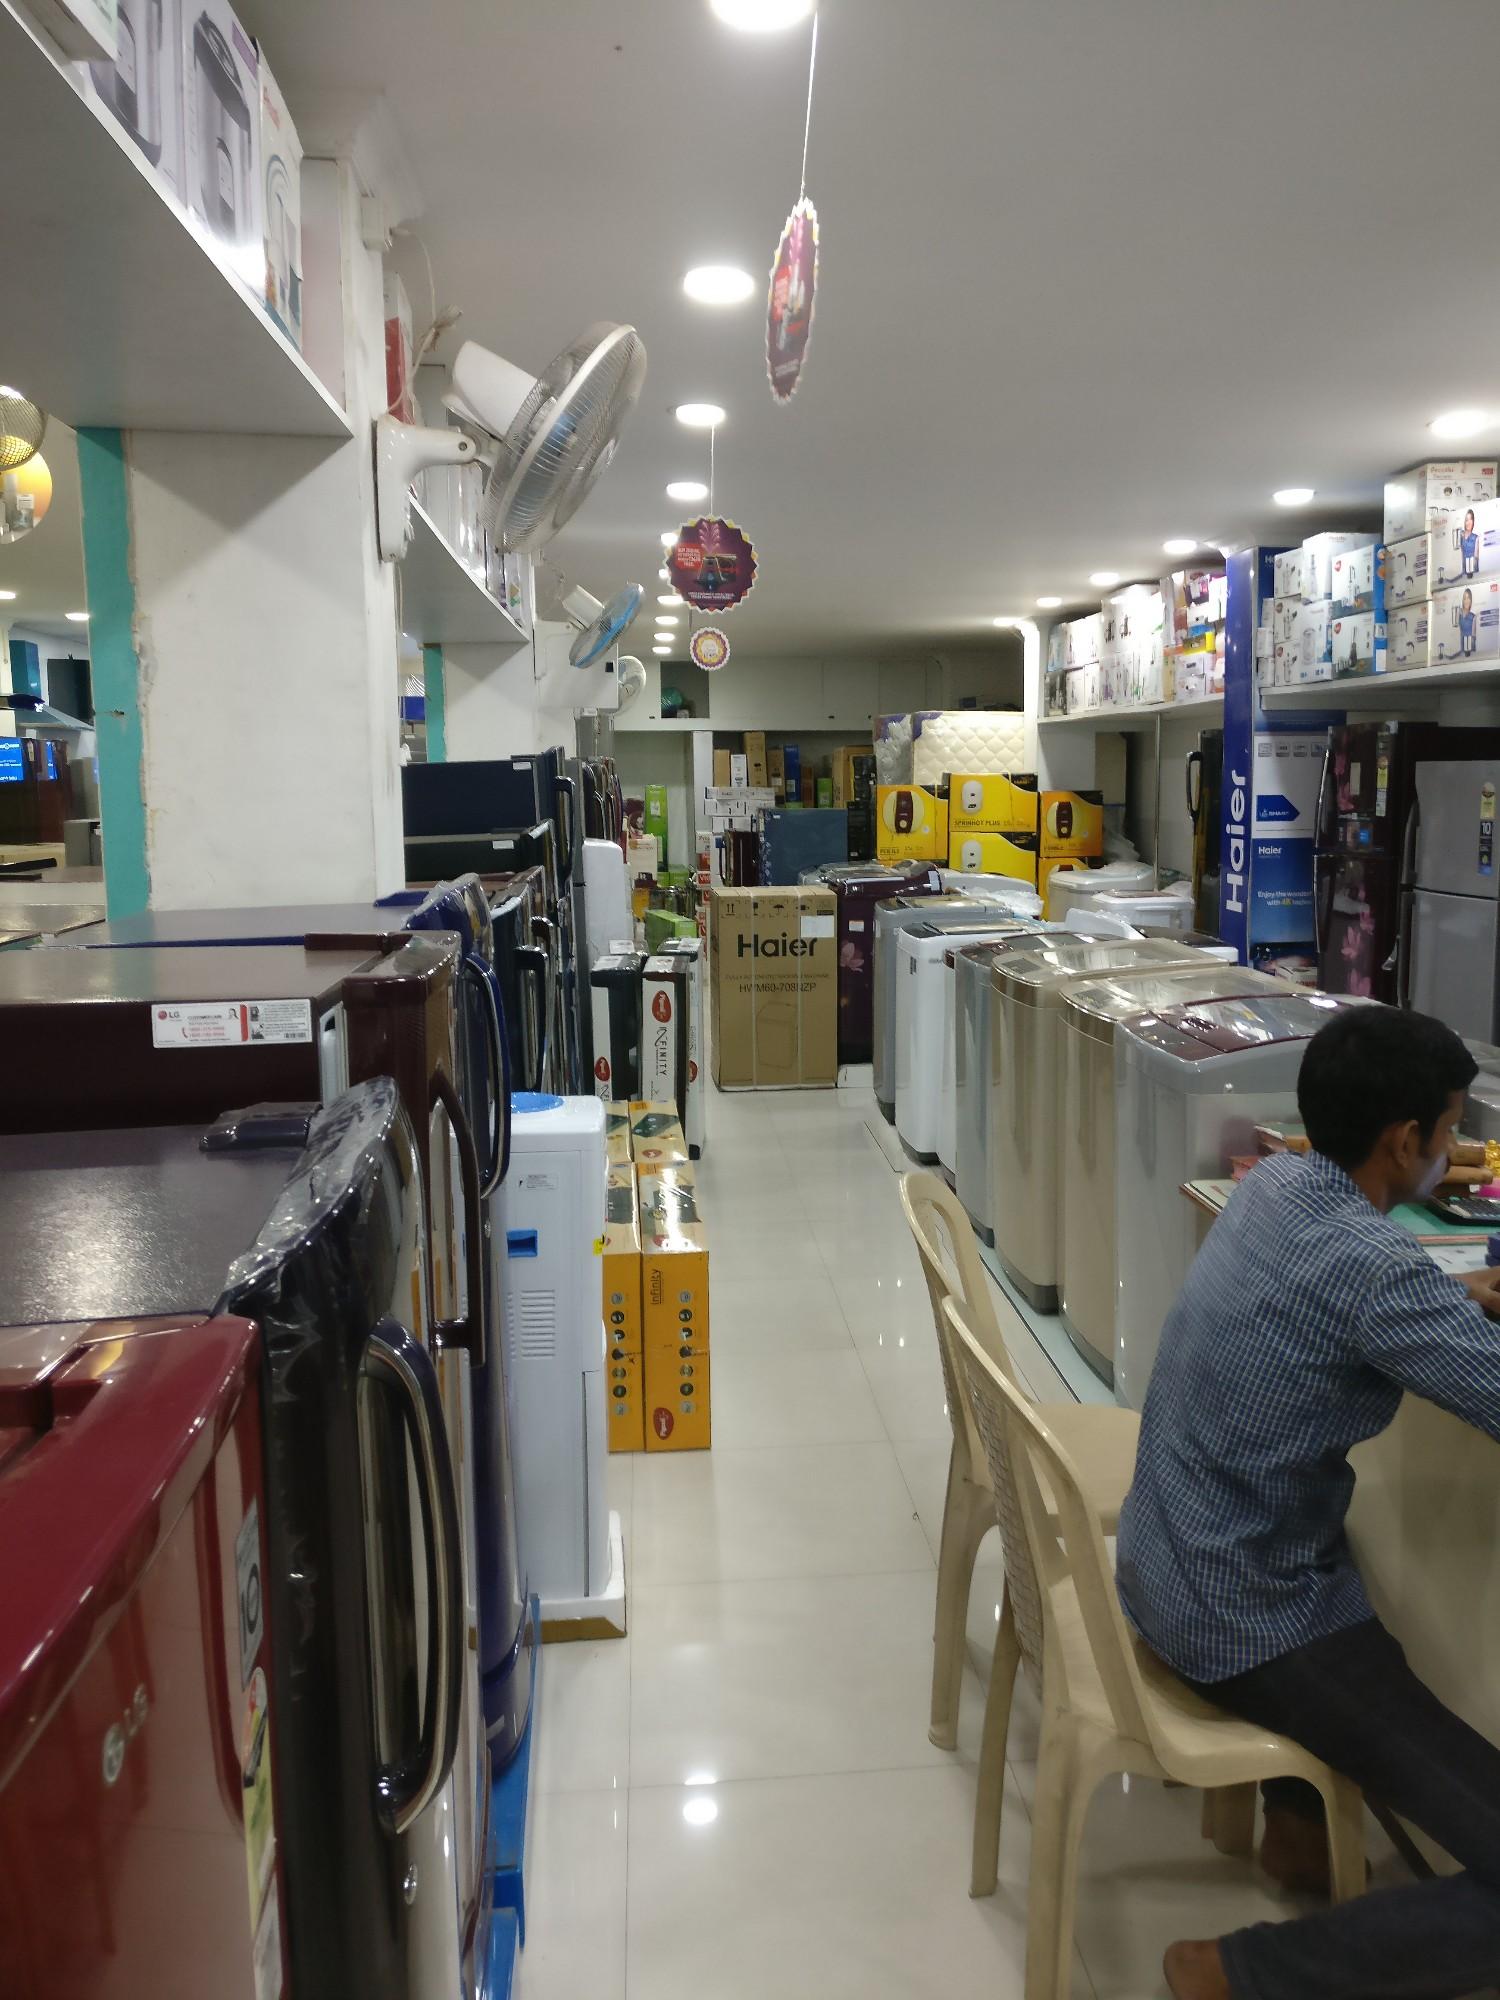 Top 10 TV Dealers in Tirupattur, Vellore, LED Television for